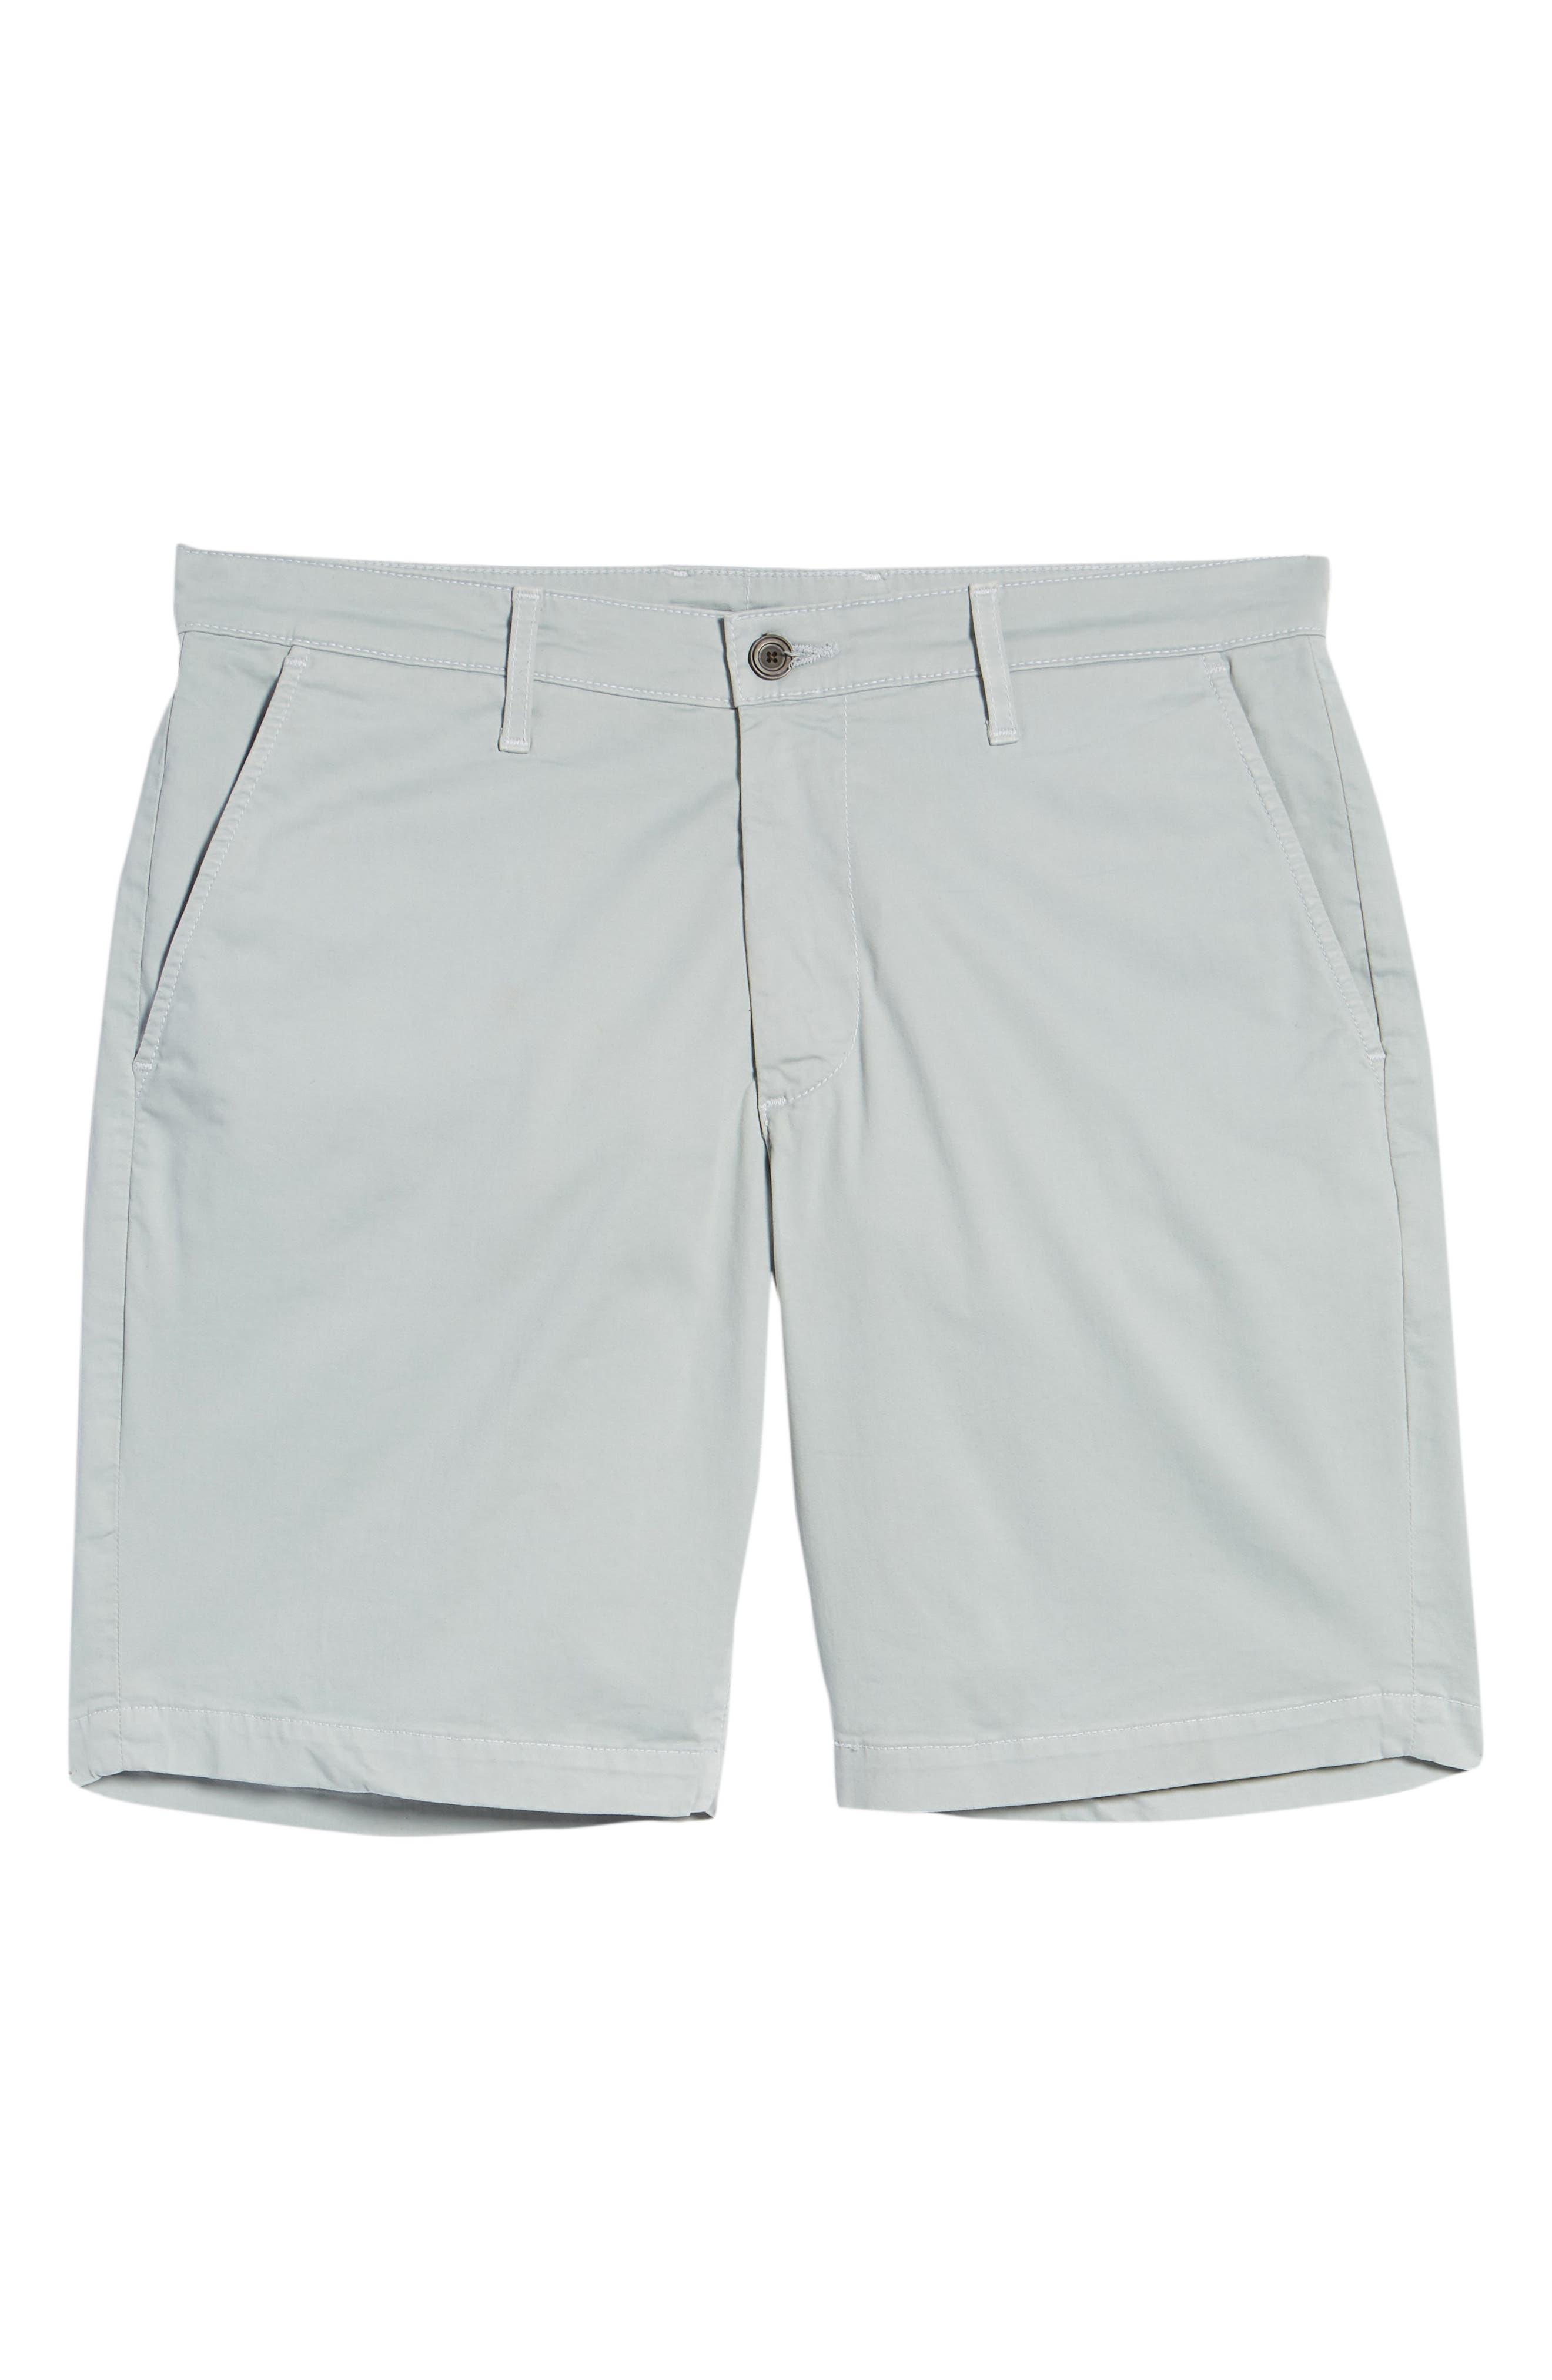 Wanderer Modern Slim Fit Shorts,                             Alternate thumbnail 6, color,                             MORNING MIST